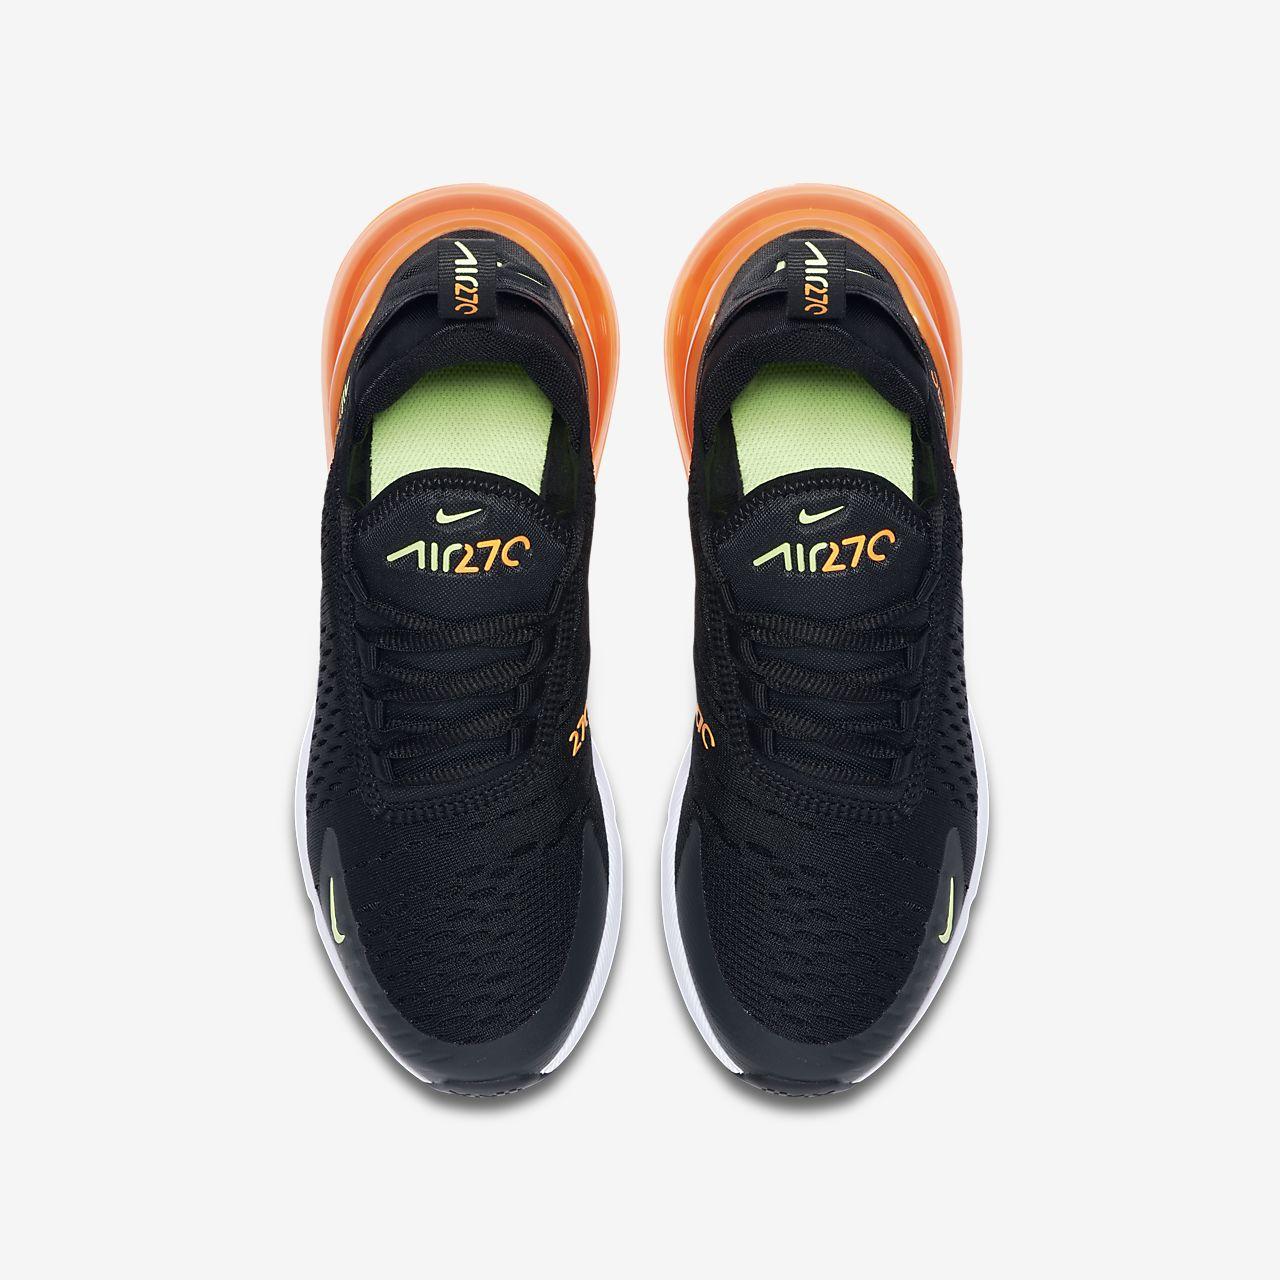 nike air max 270 black-ghost green-total orange